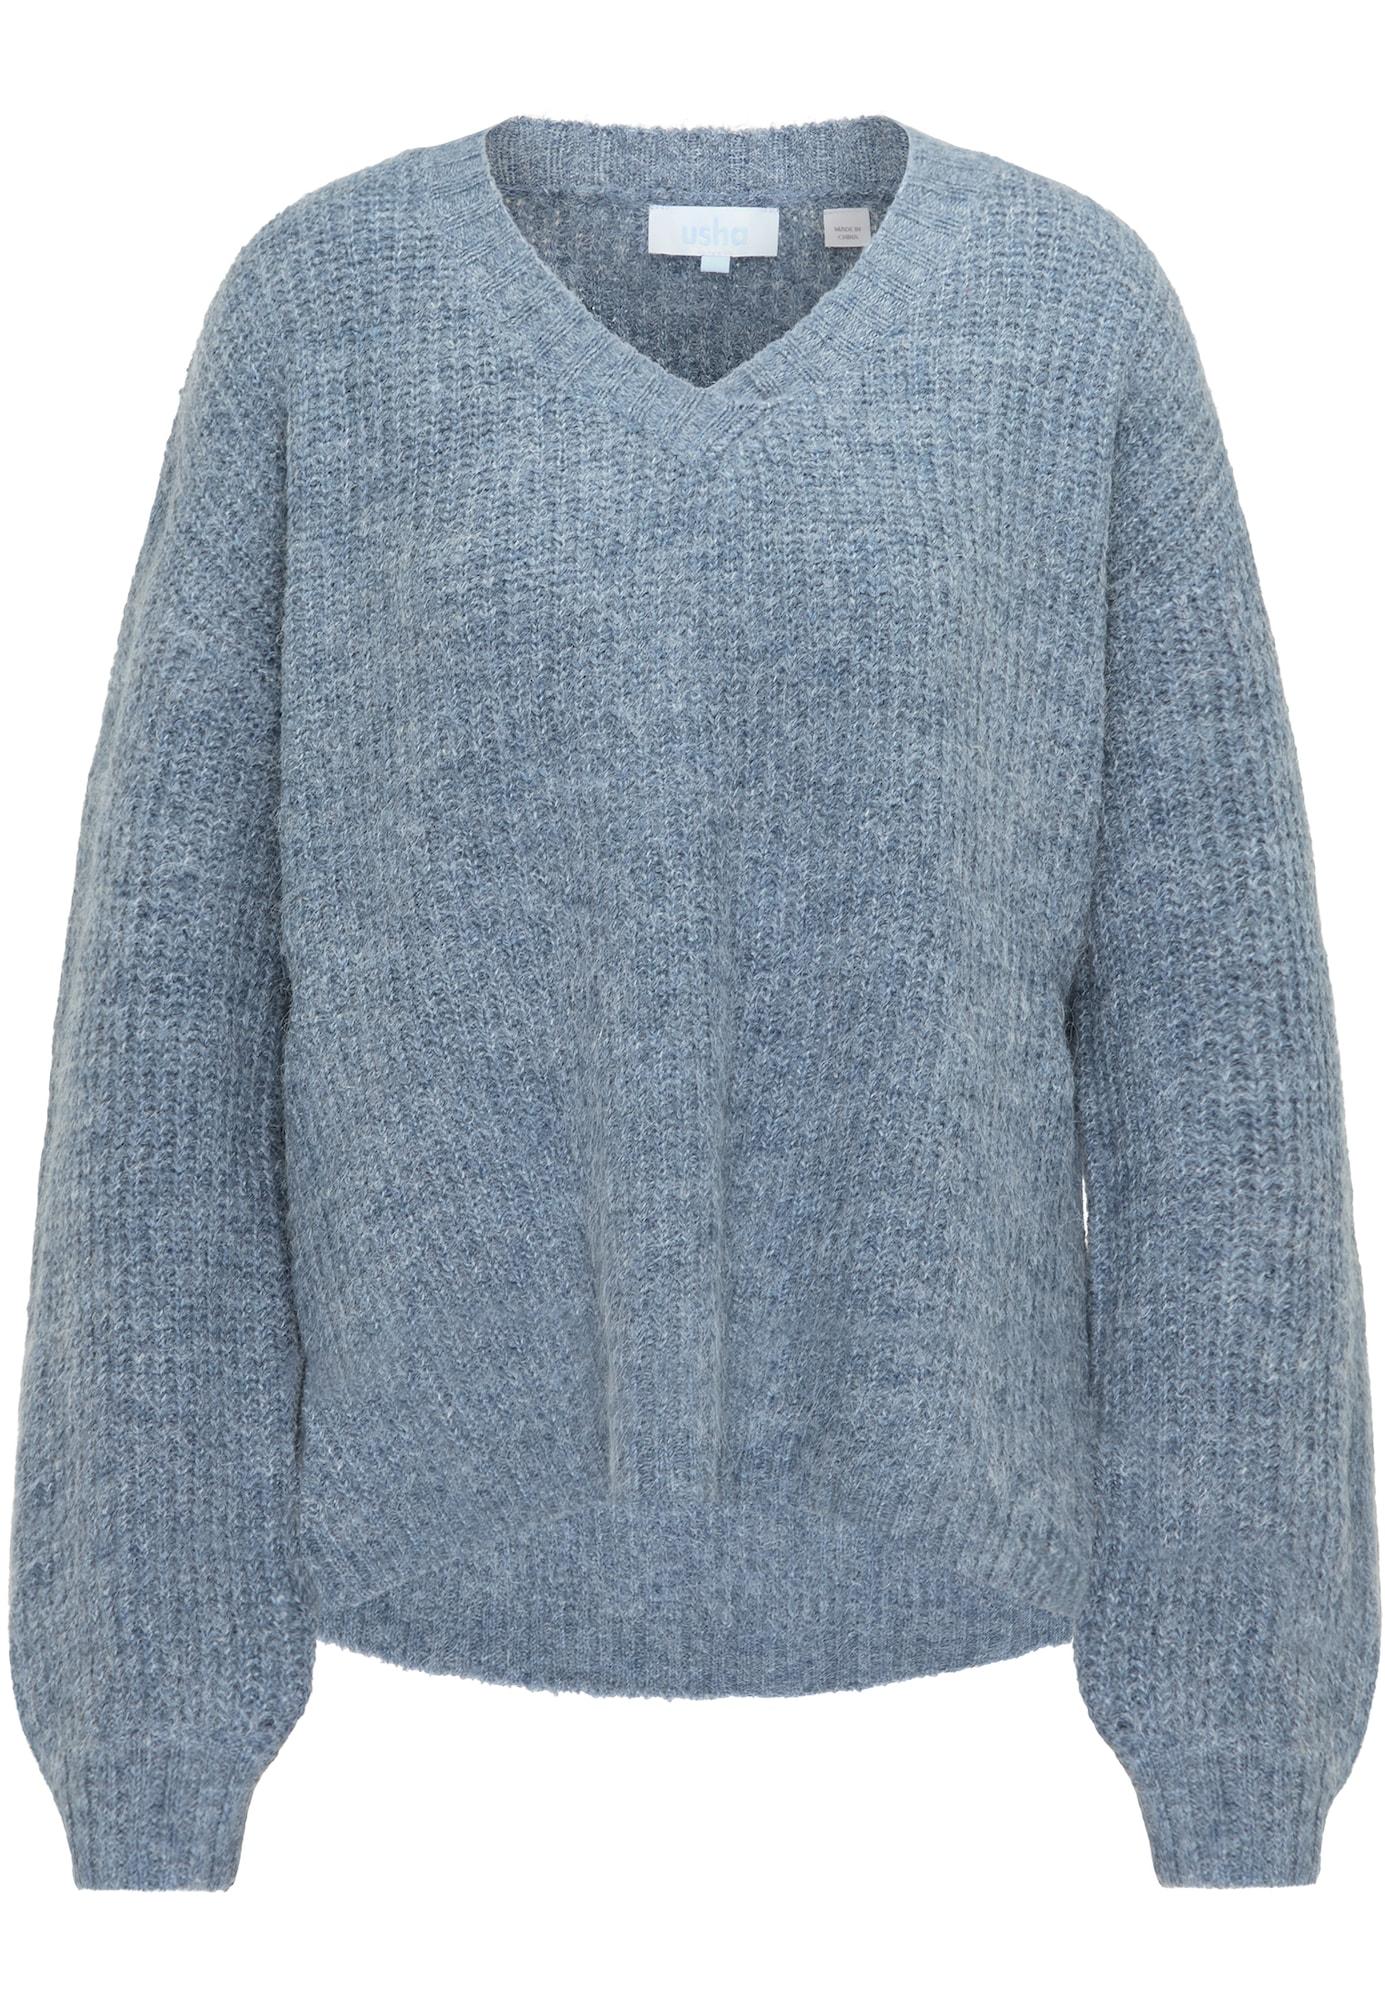 usha BLUE LABEL Laisvas megztinis mėlyna dūmų spalva / vilnos balta